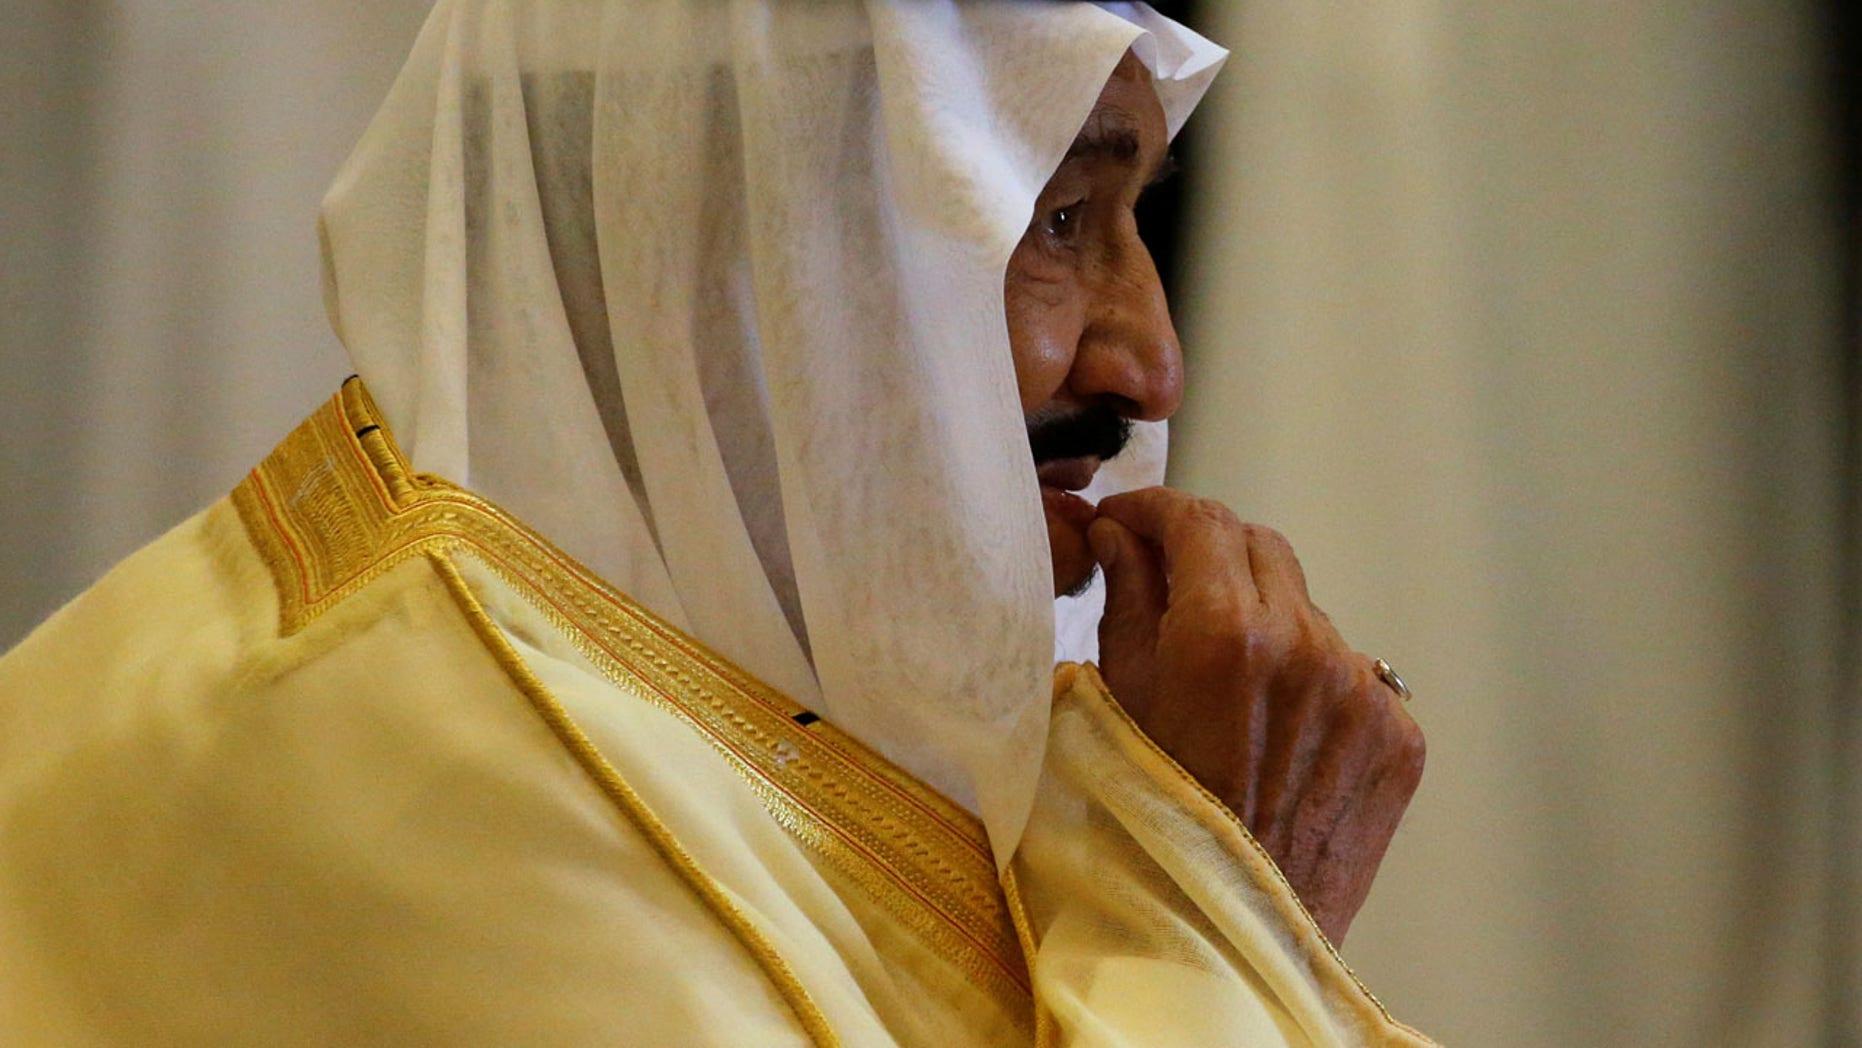 Saudi Arabia's King Salman bin Abdulaziz Al Saud waits to greet President Trump in Riyadh